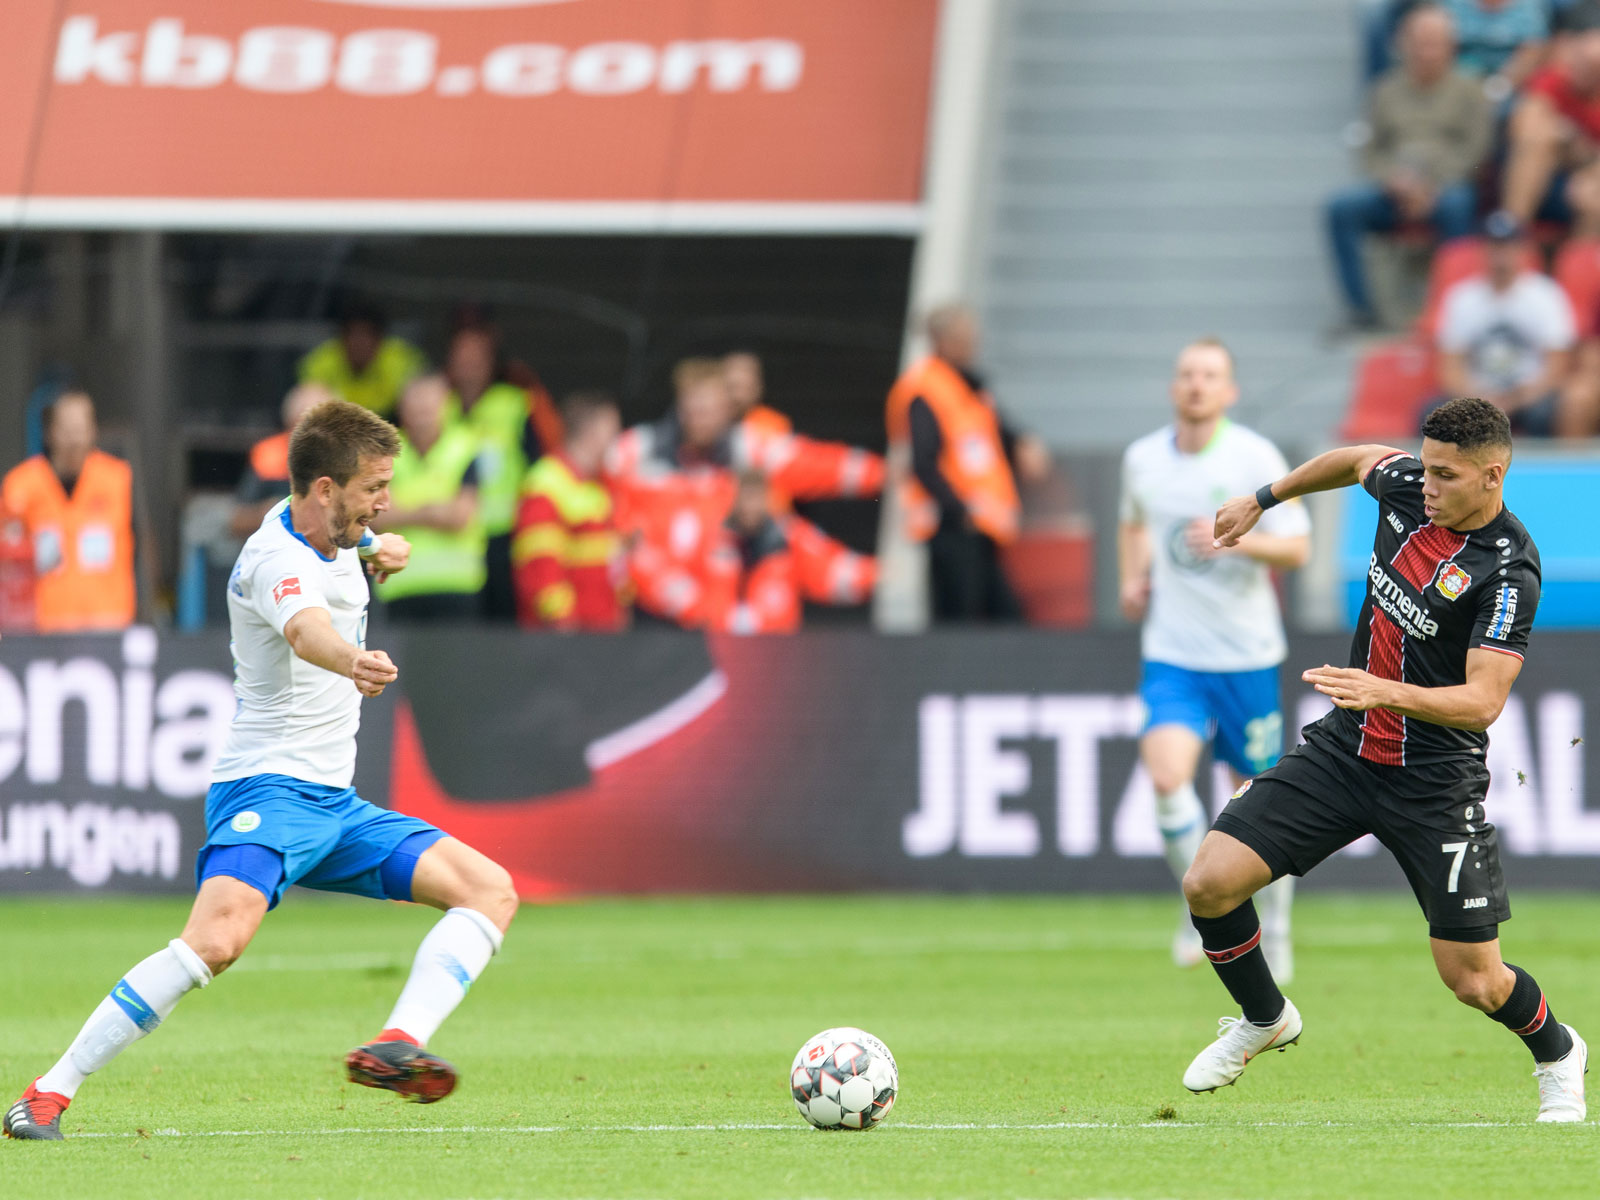 Brazilian Paulinho is Bayer Leverkusen s most recent young star acquisition a349b04533640